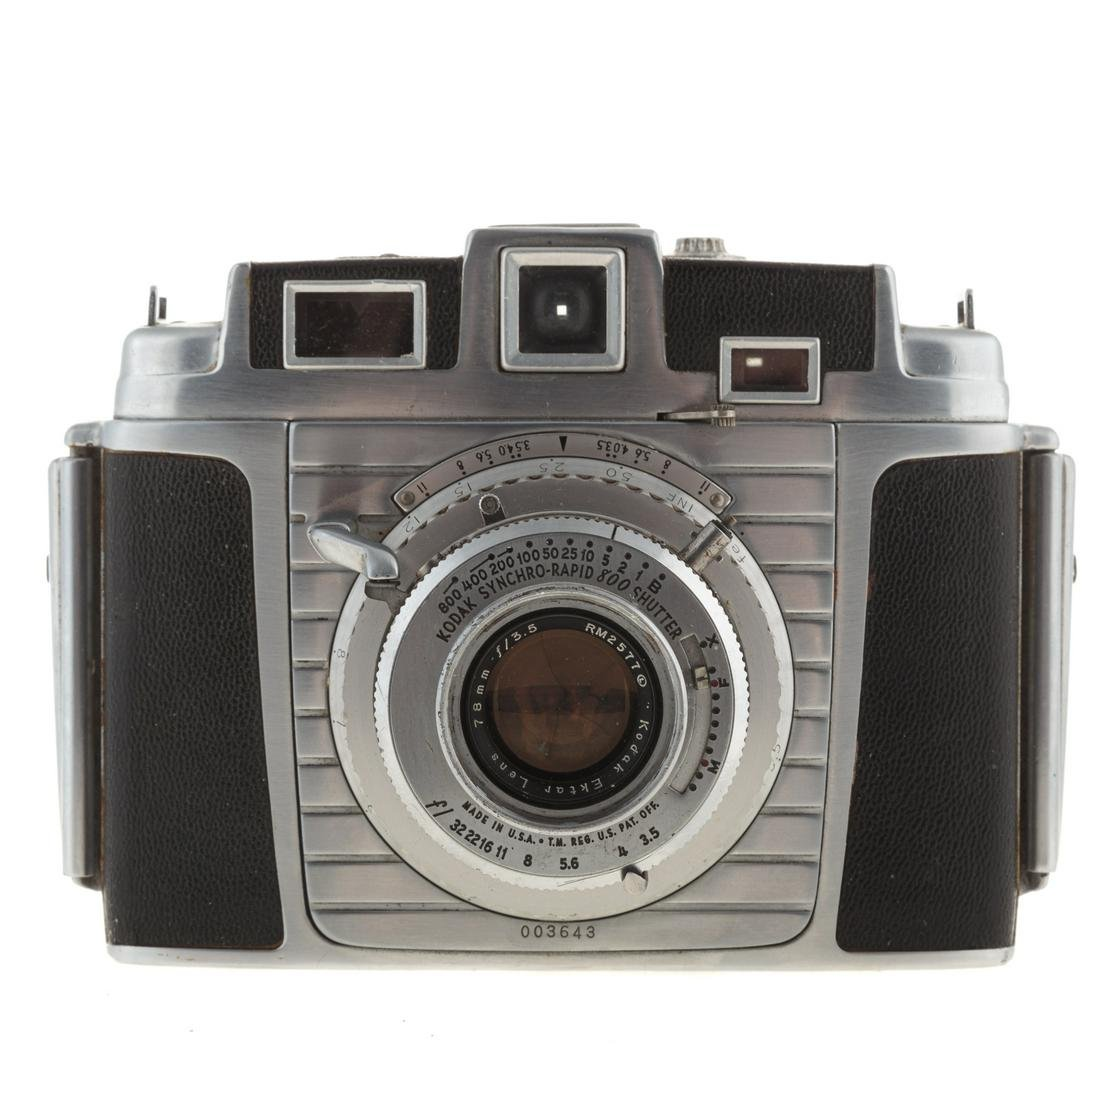 Kodak Chevron #620 Camera & Ektar 78 mm Lens